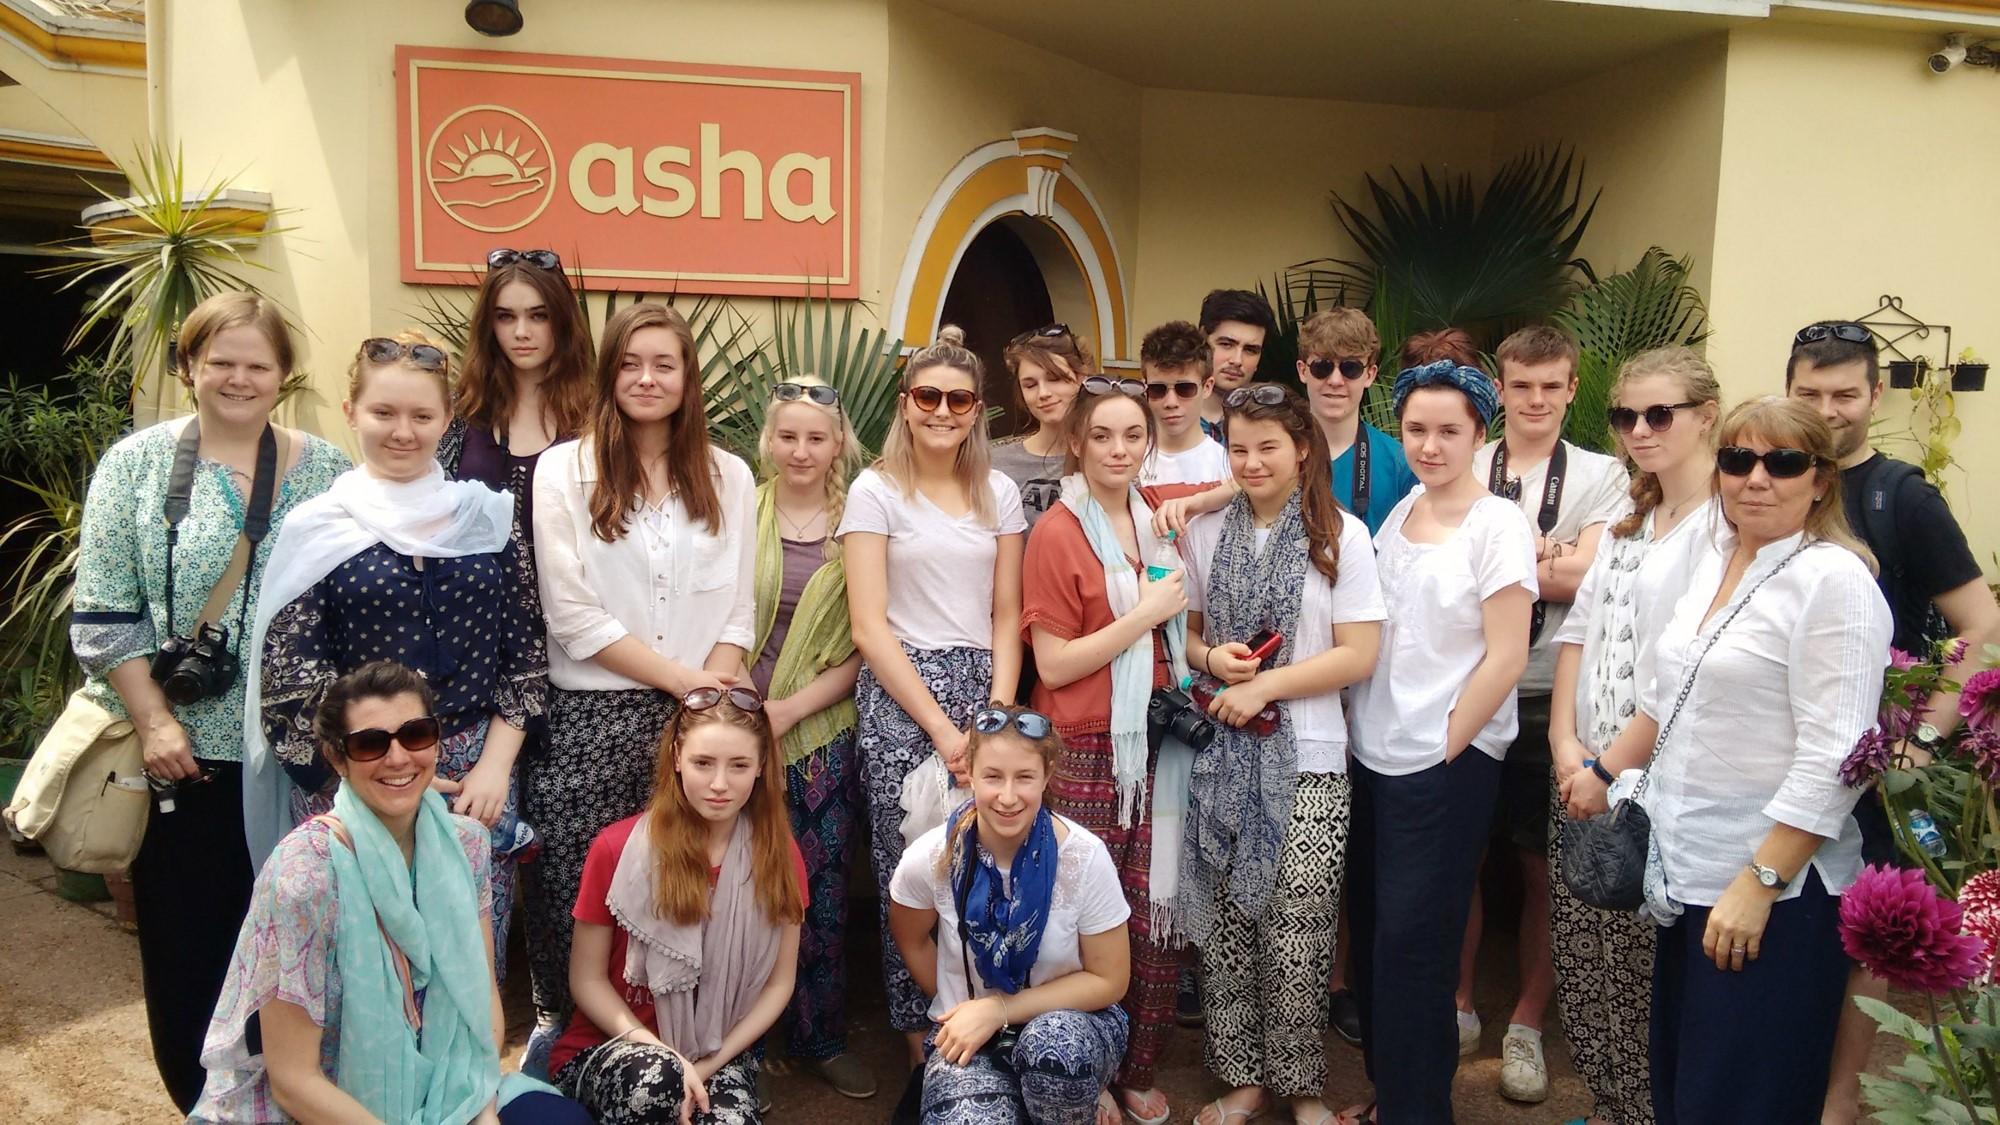 The Gryphon School team at Asha Society's headquarters